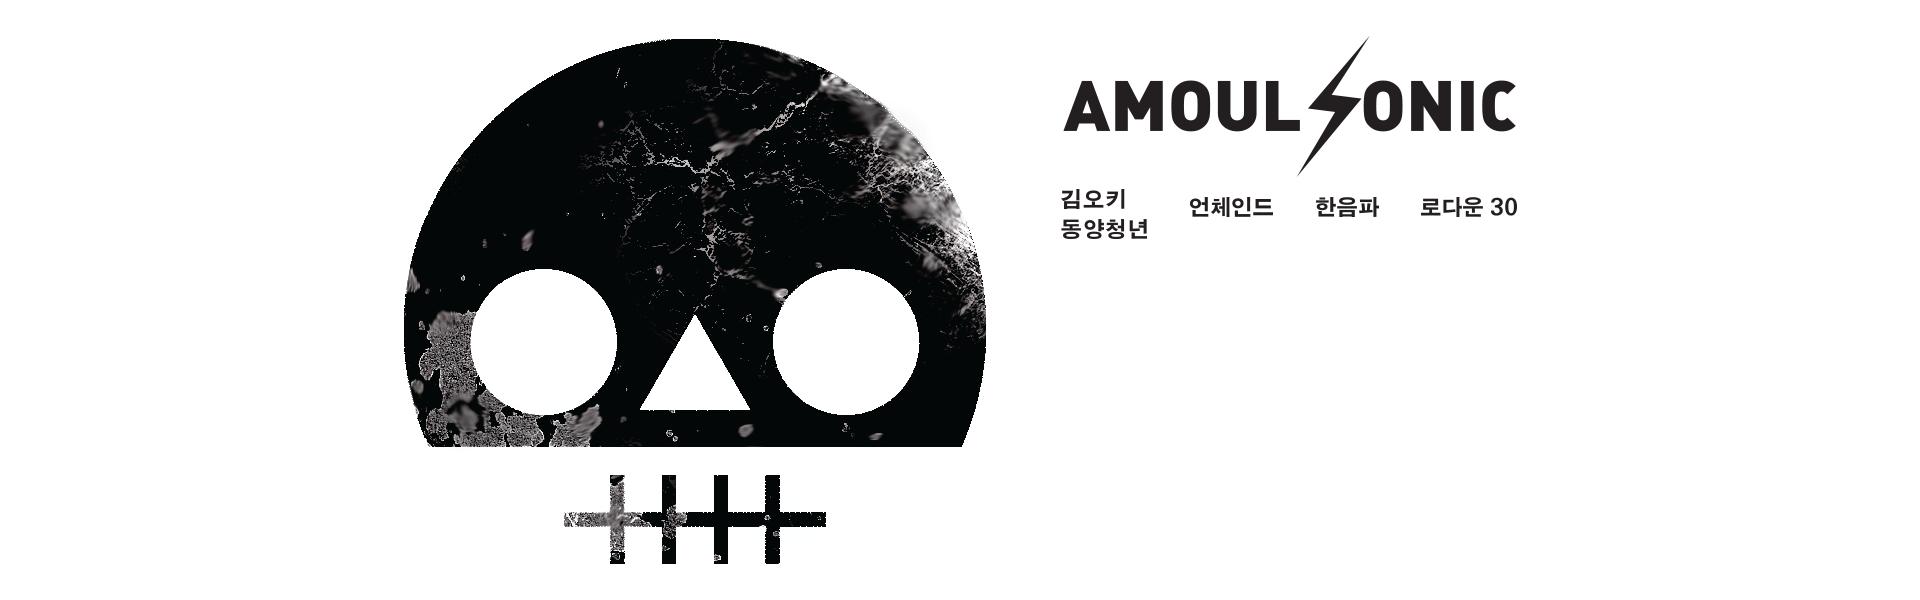 amoulsonic2014